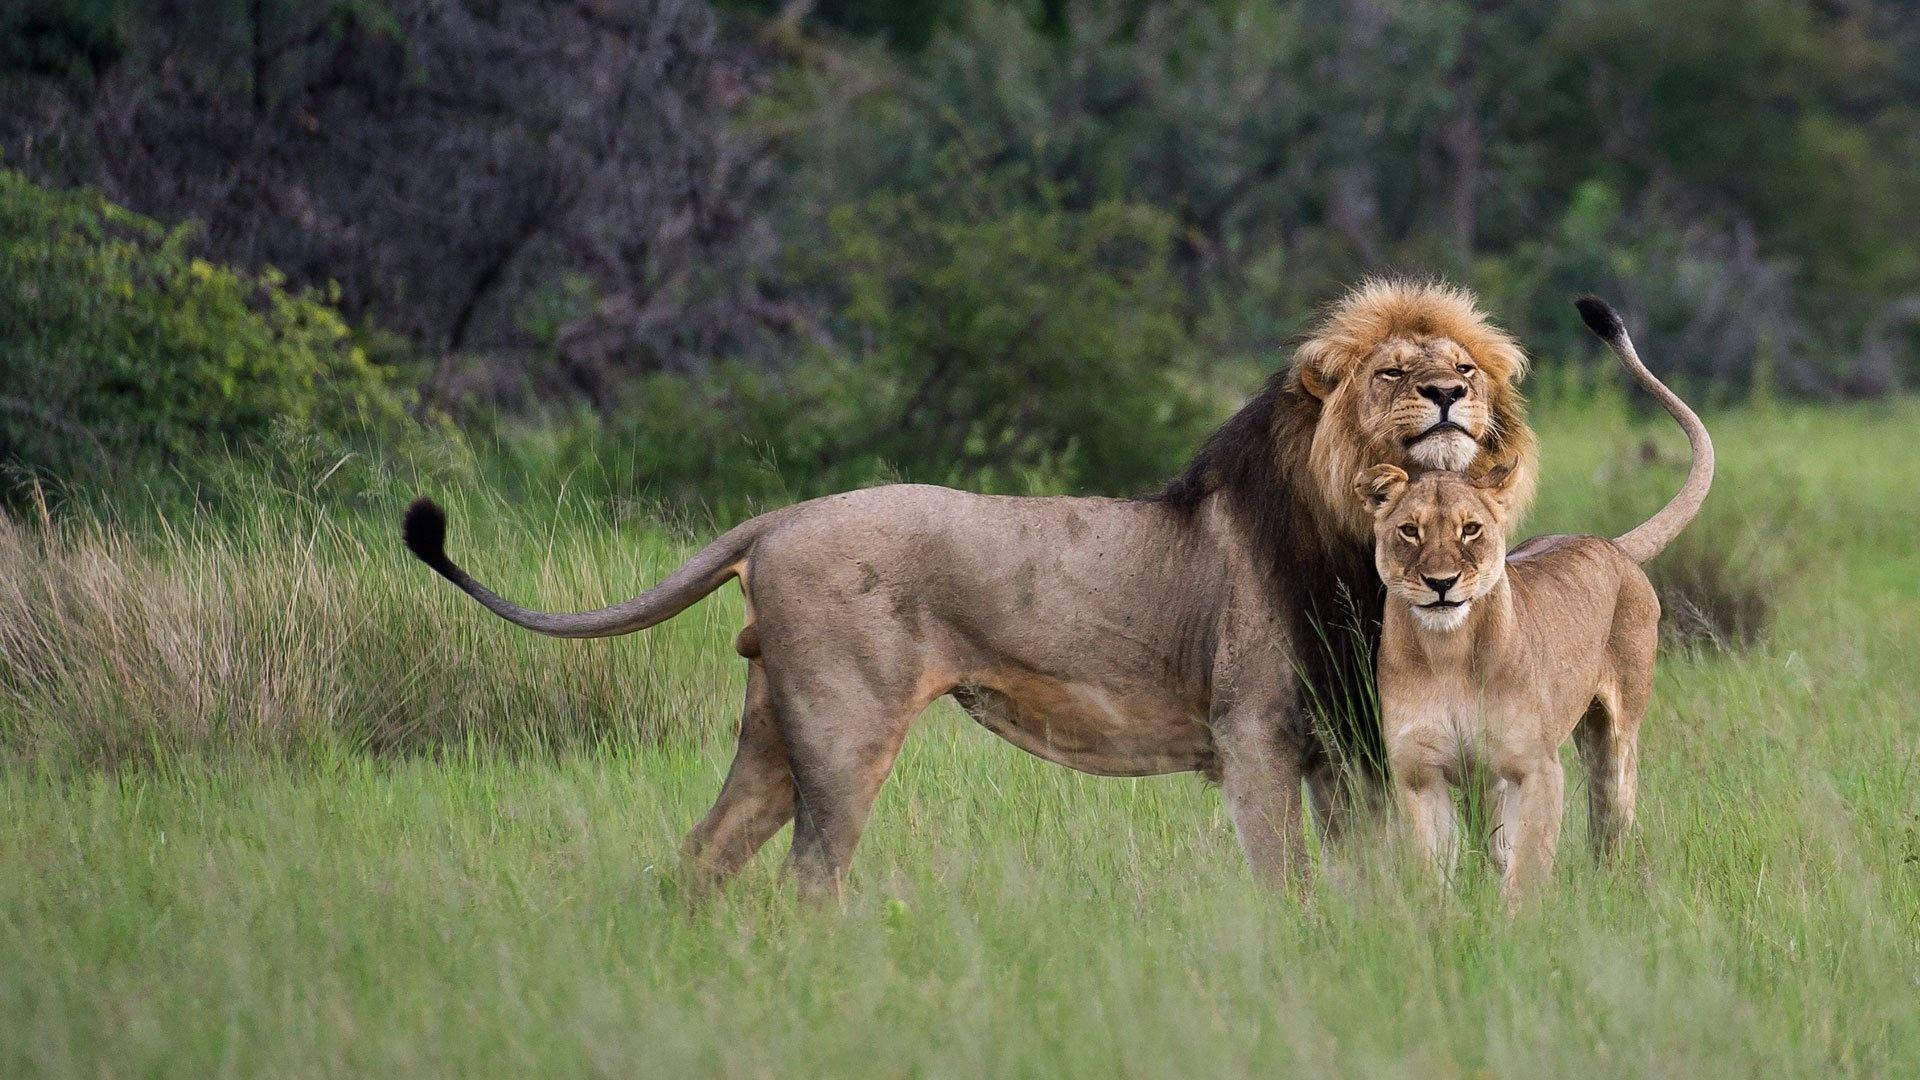 3-Day Murchison Falls National Park Experience - Mid-range safari